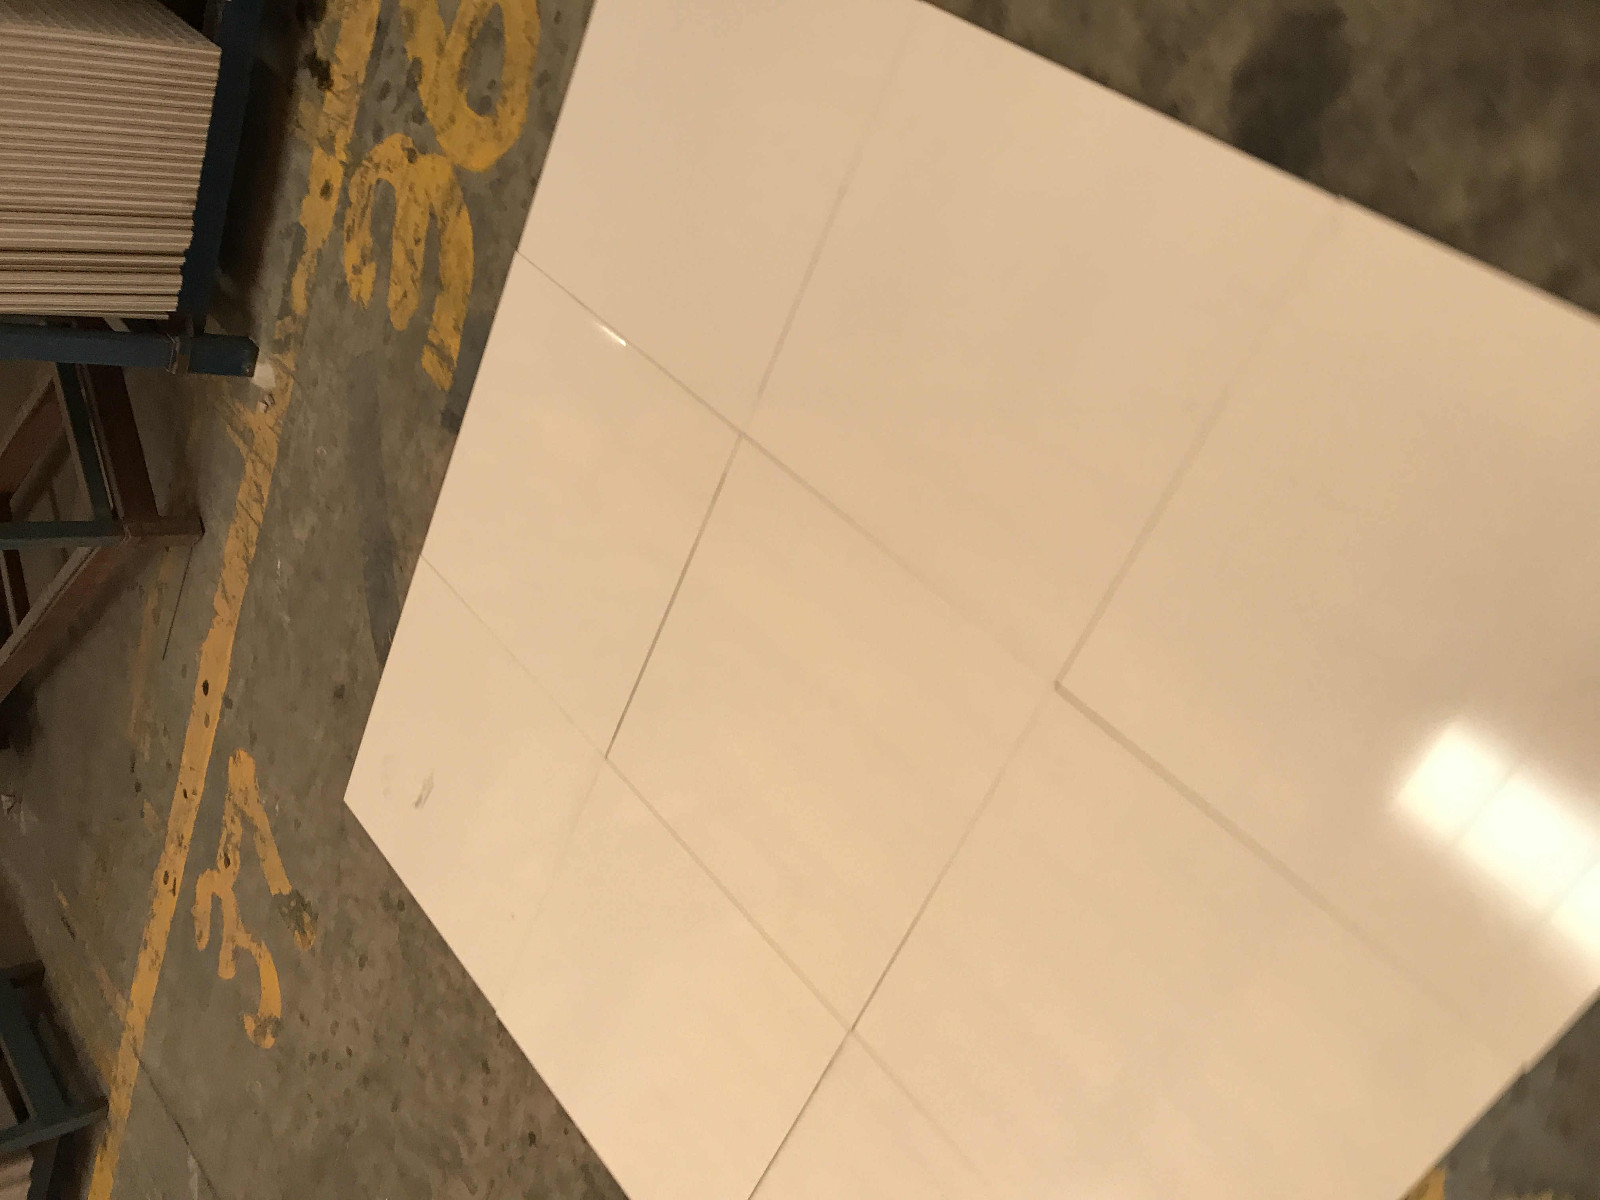 24''X24''/32''x32'' Light Grey Living Room Marble Look Floor Tile SJ66G0C21T/M-7